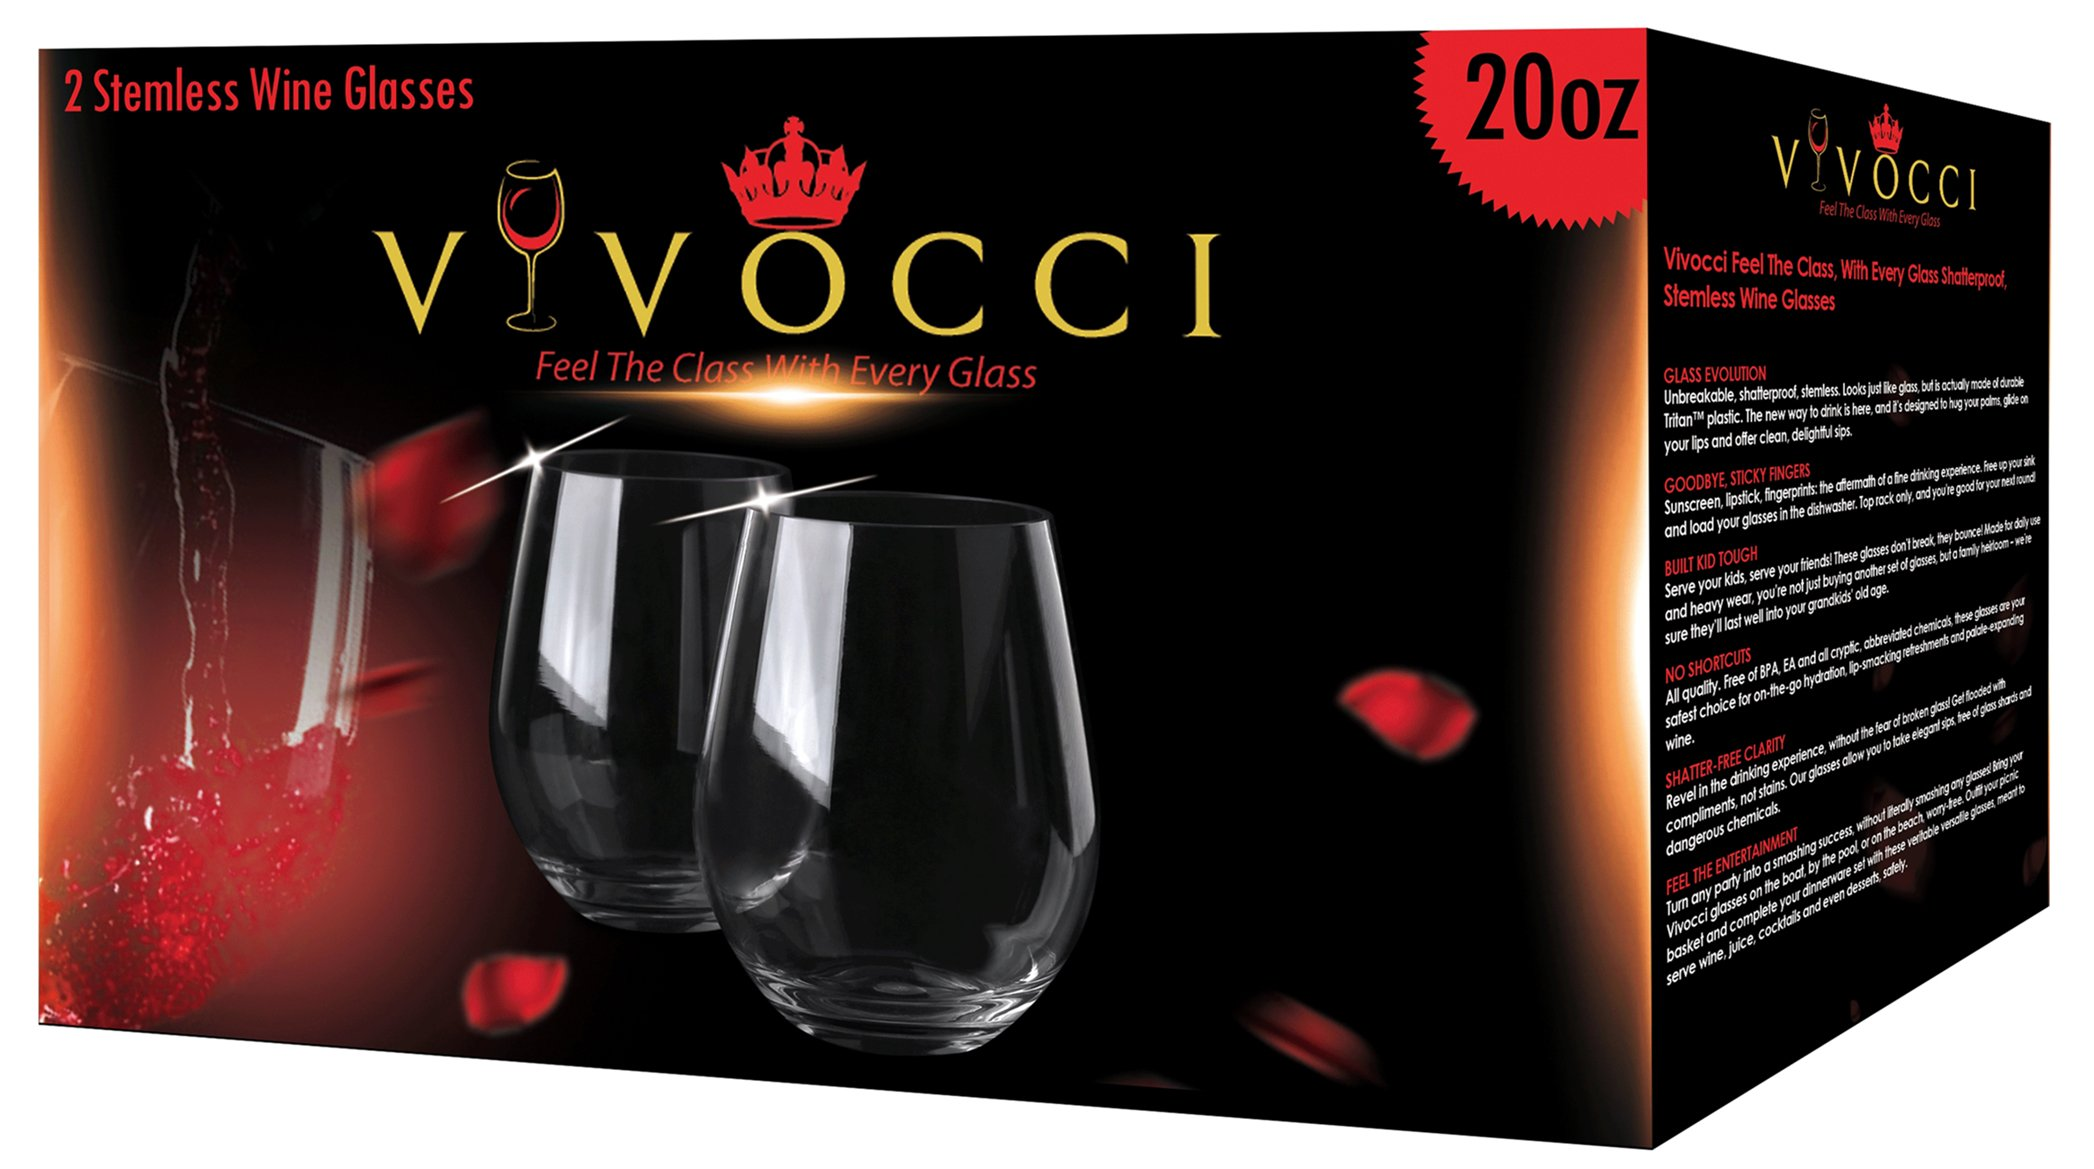 Vivocci Unbreakable Elegant Plastic Stemless Wine Glasses 20 oz | 100% Tritan Heavy Base | Shatterproof Glassware | Ideal For Cocktails & Scotch | Perfect For Homes & Bars | Dishwasher Safe | Set of 2 by Vivocci (Image #2)